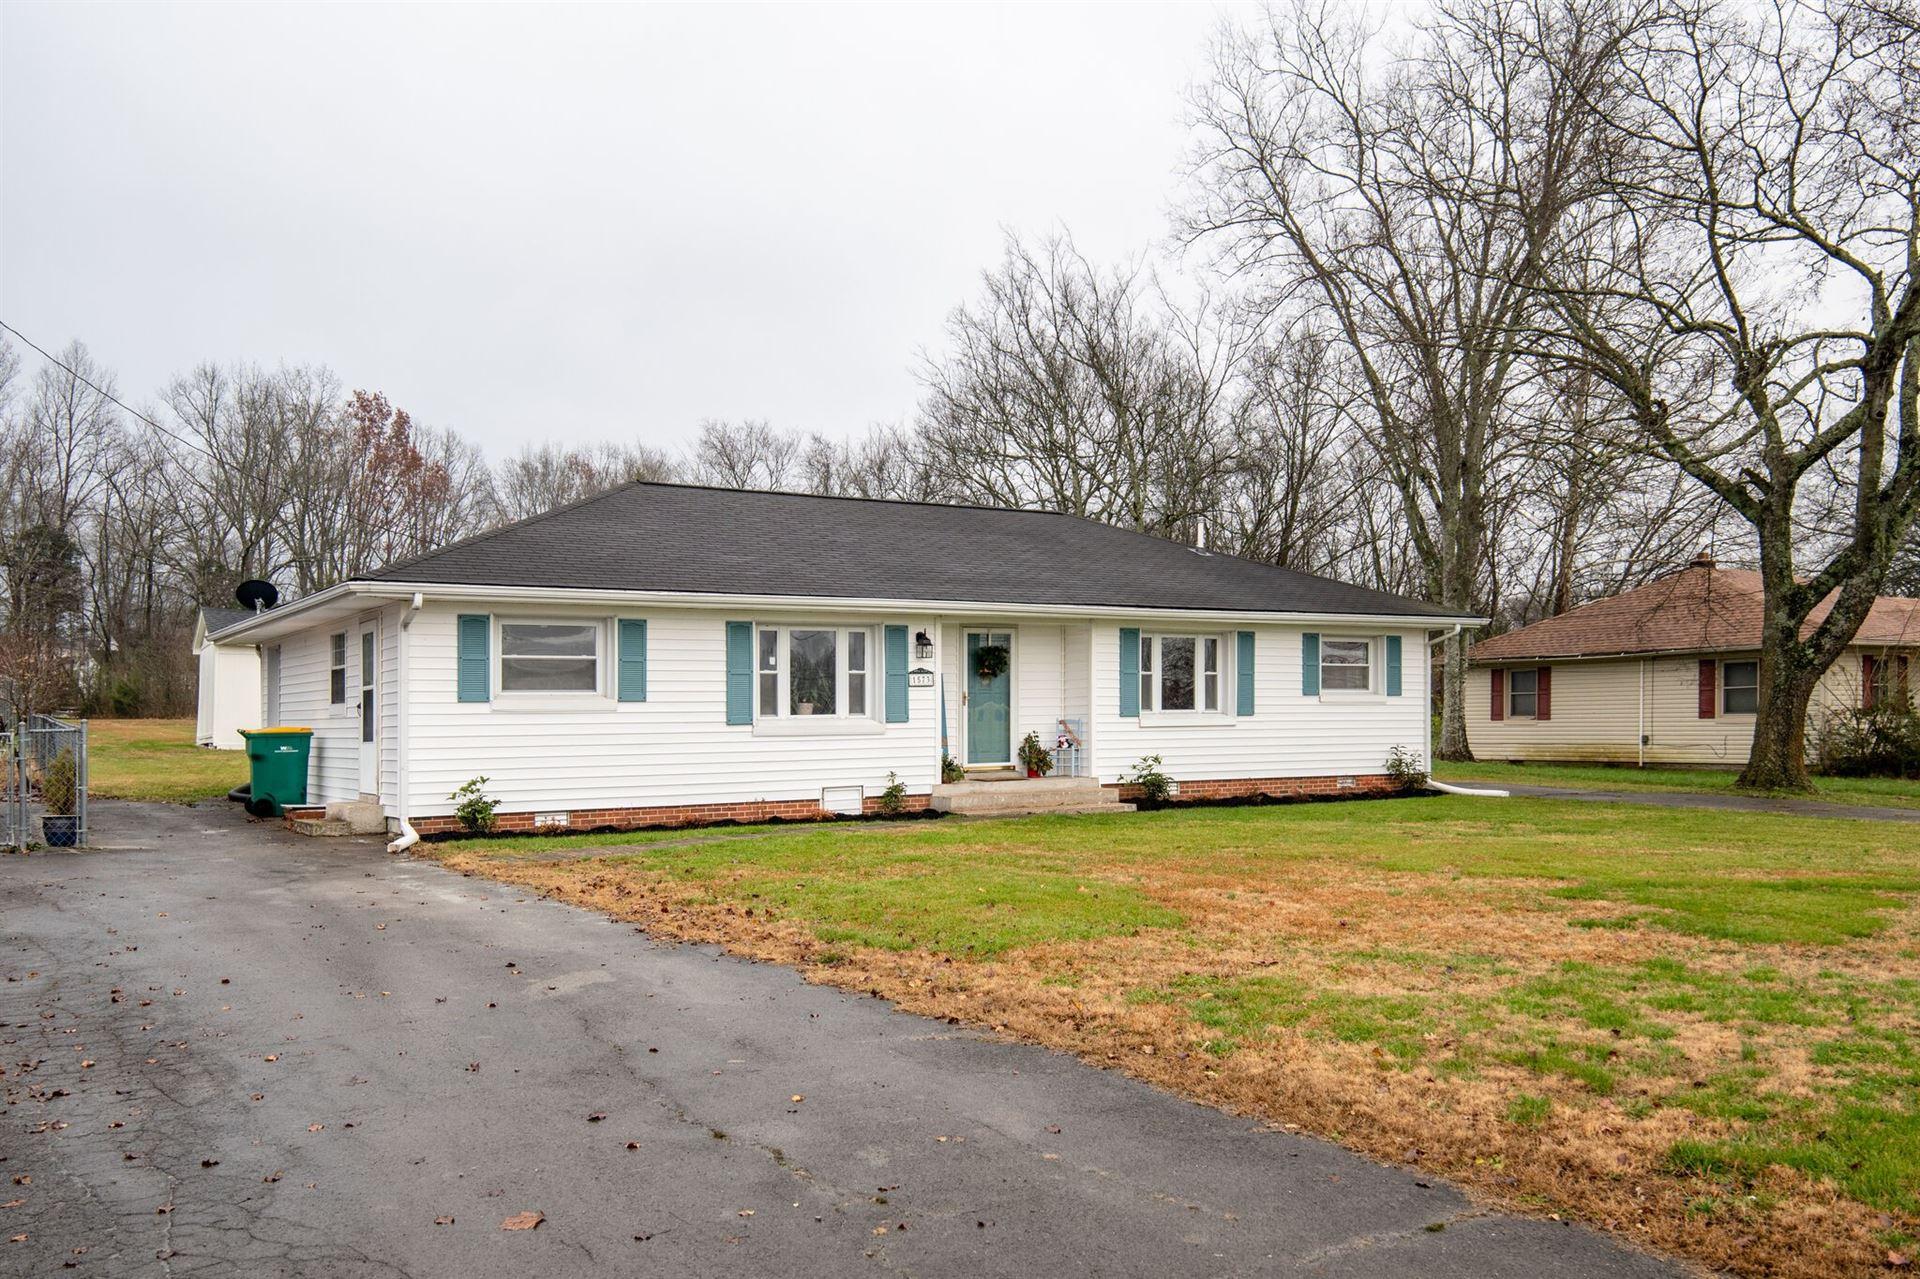 1573 Old Farmington Rd, Lewisburg, TN 37091 - MLS#: 2215288